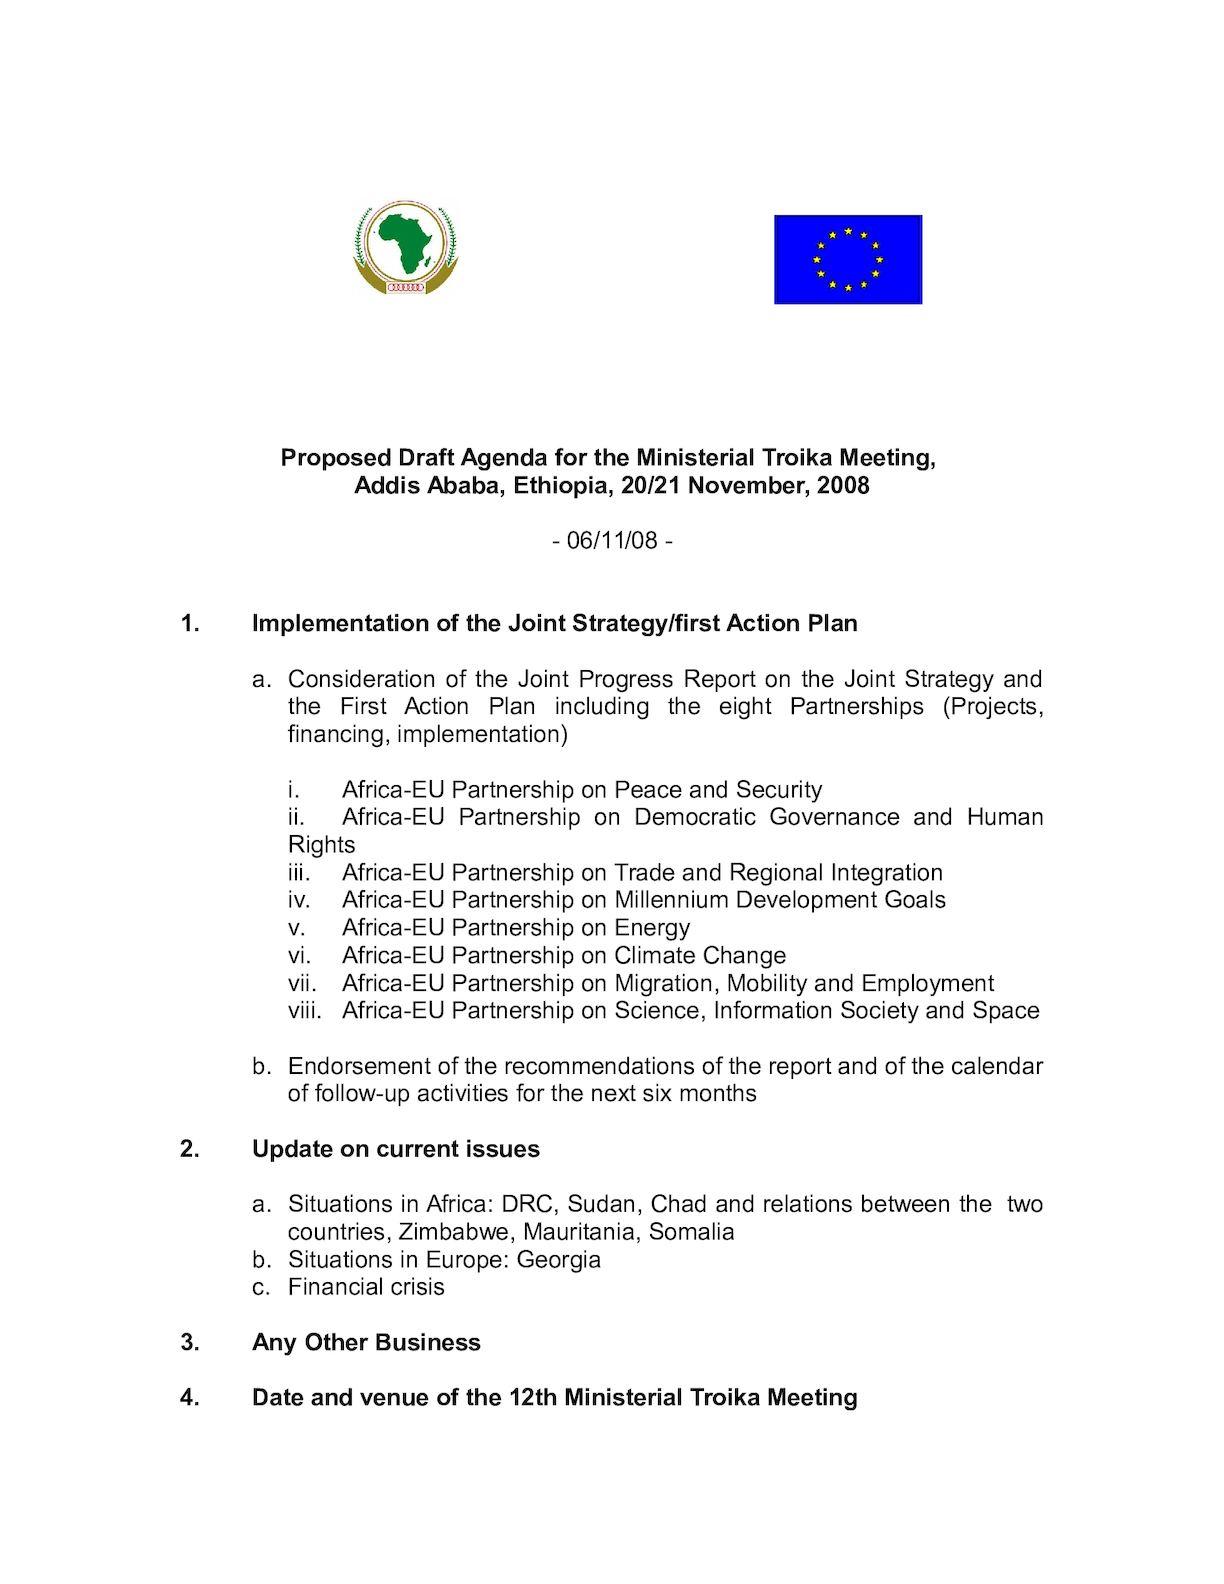 081105 Draft Agenda For Addis Ministerial Troika